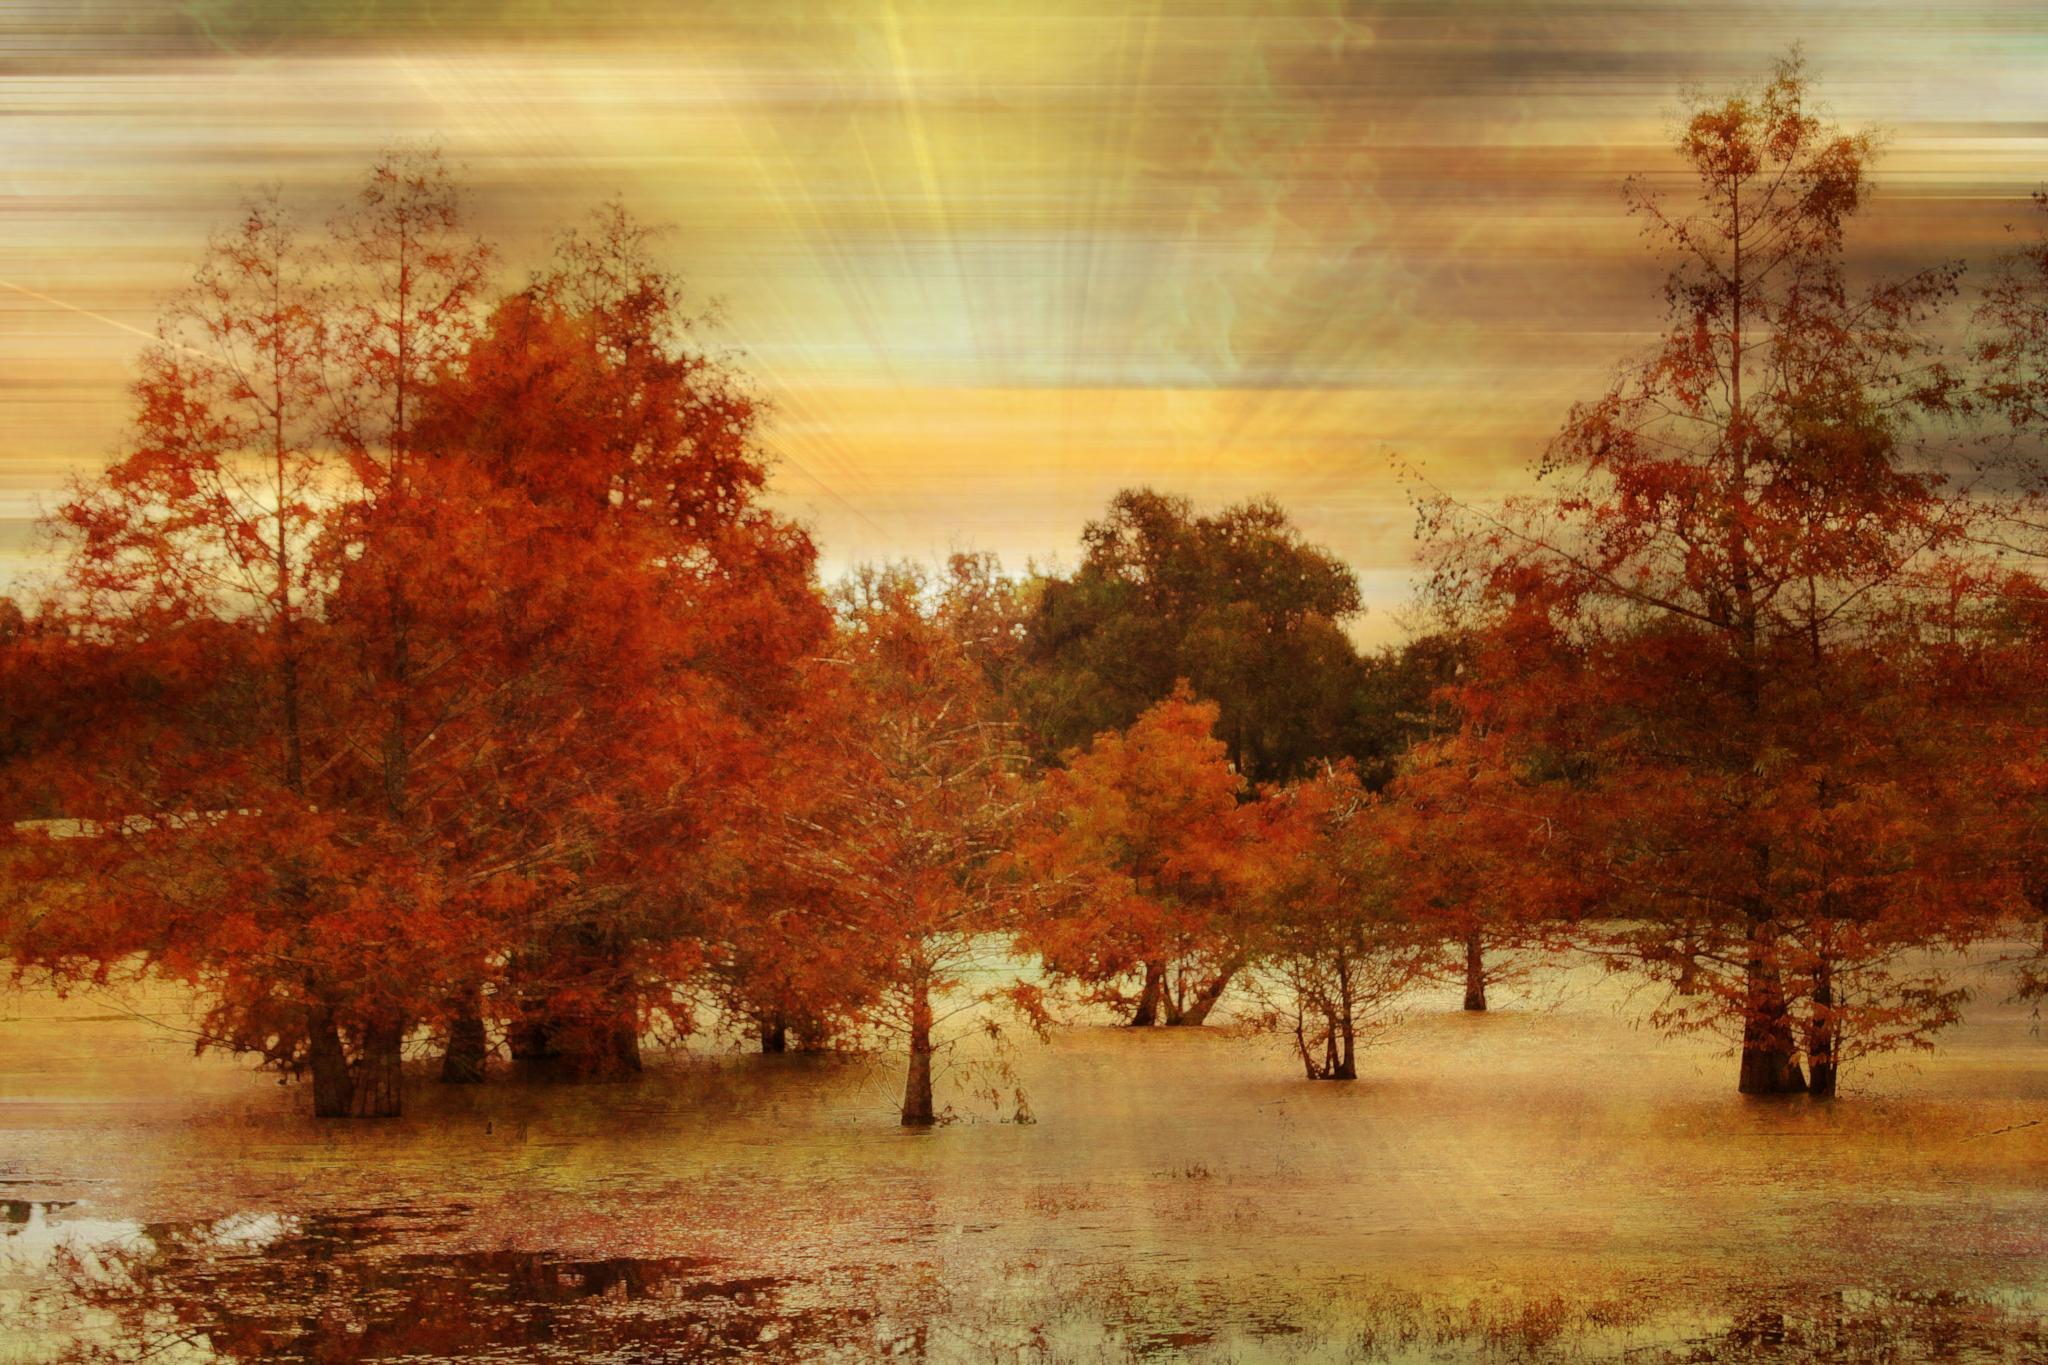 Cypress Swamp In Autumn by ginger.barritt